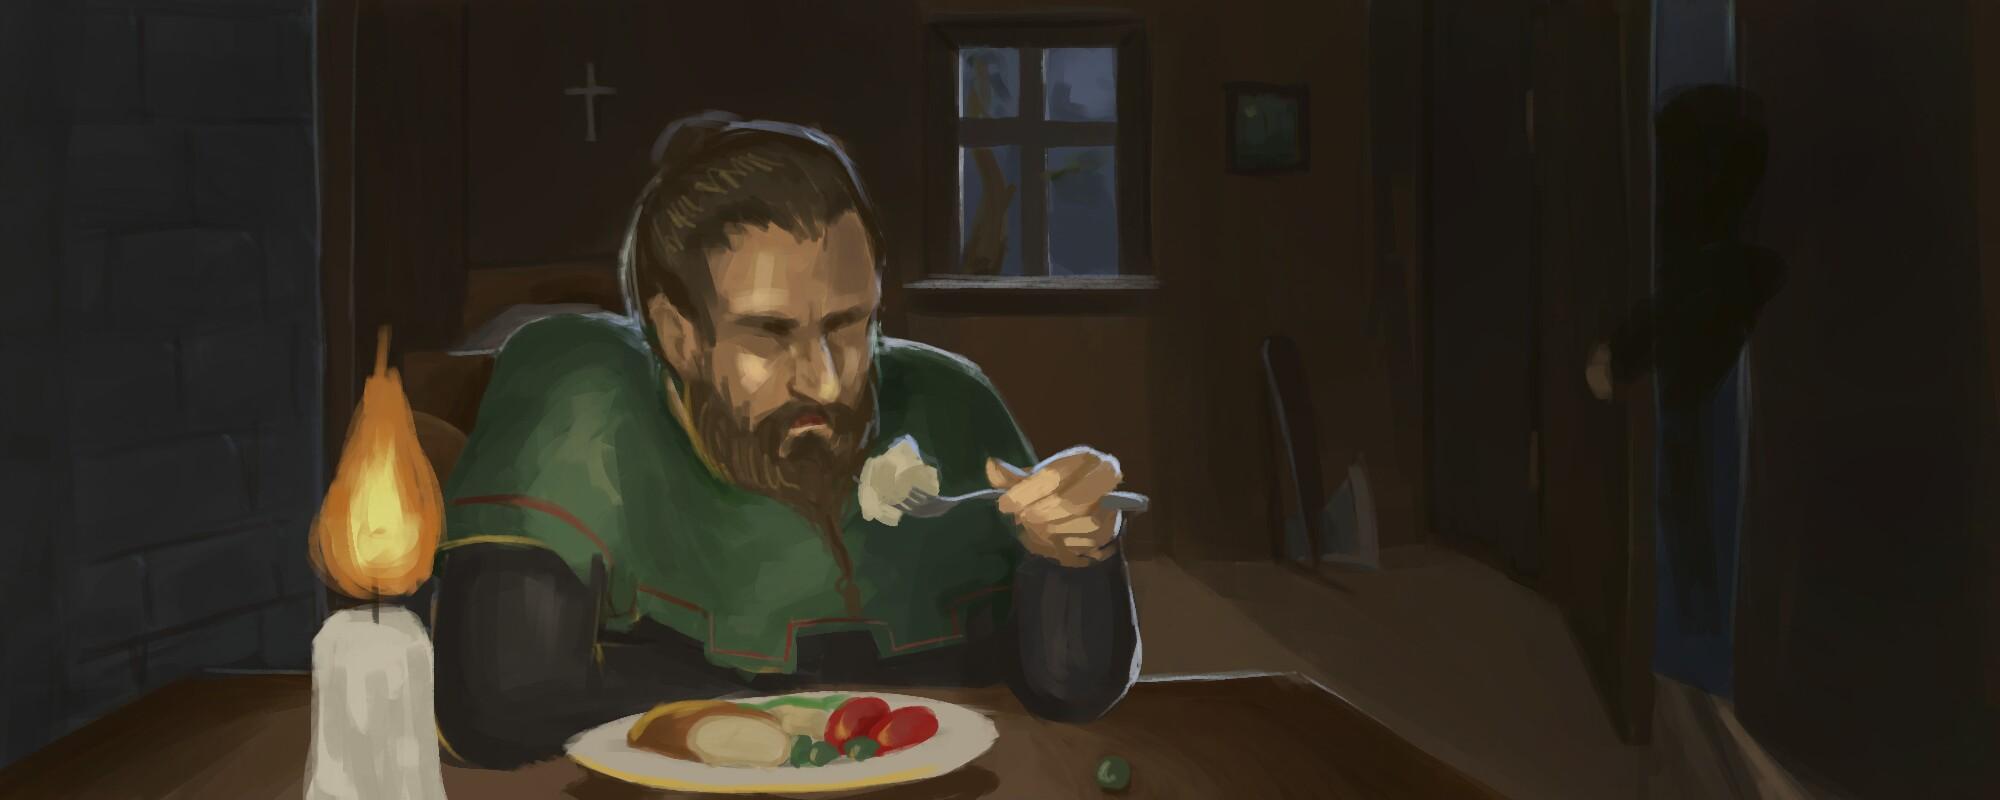 Ужин | Собираю команду